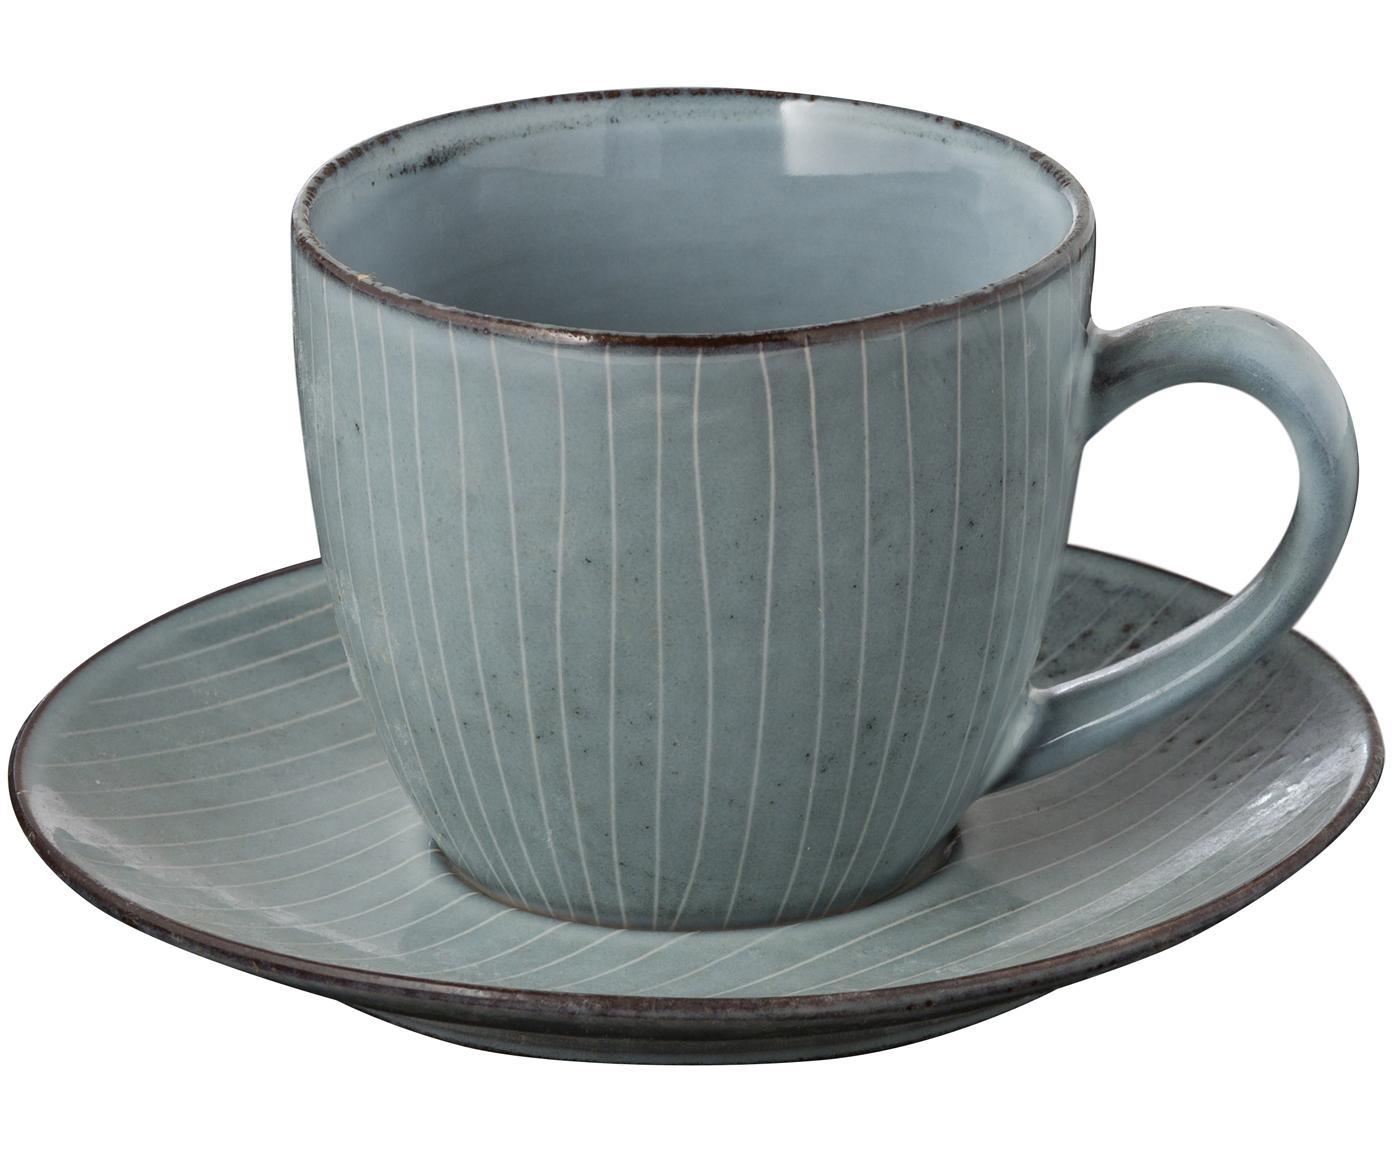 Tazza fatta a mano Nordic Sea, Terracotta, Tonalità grigie e blu, Ø 14 x Alt. 9 cm